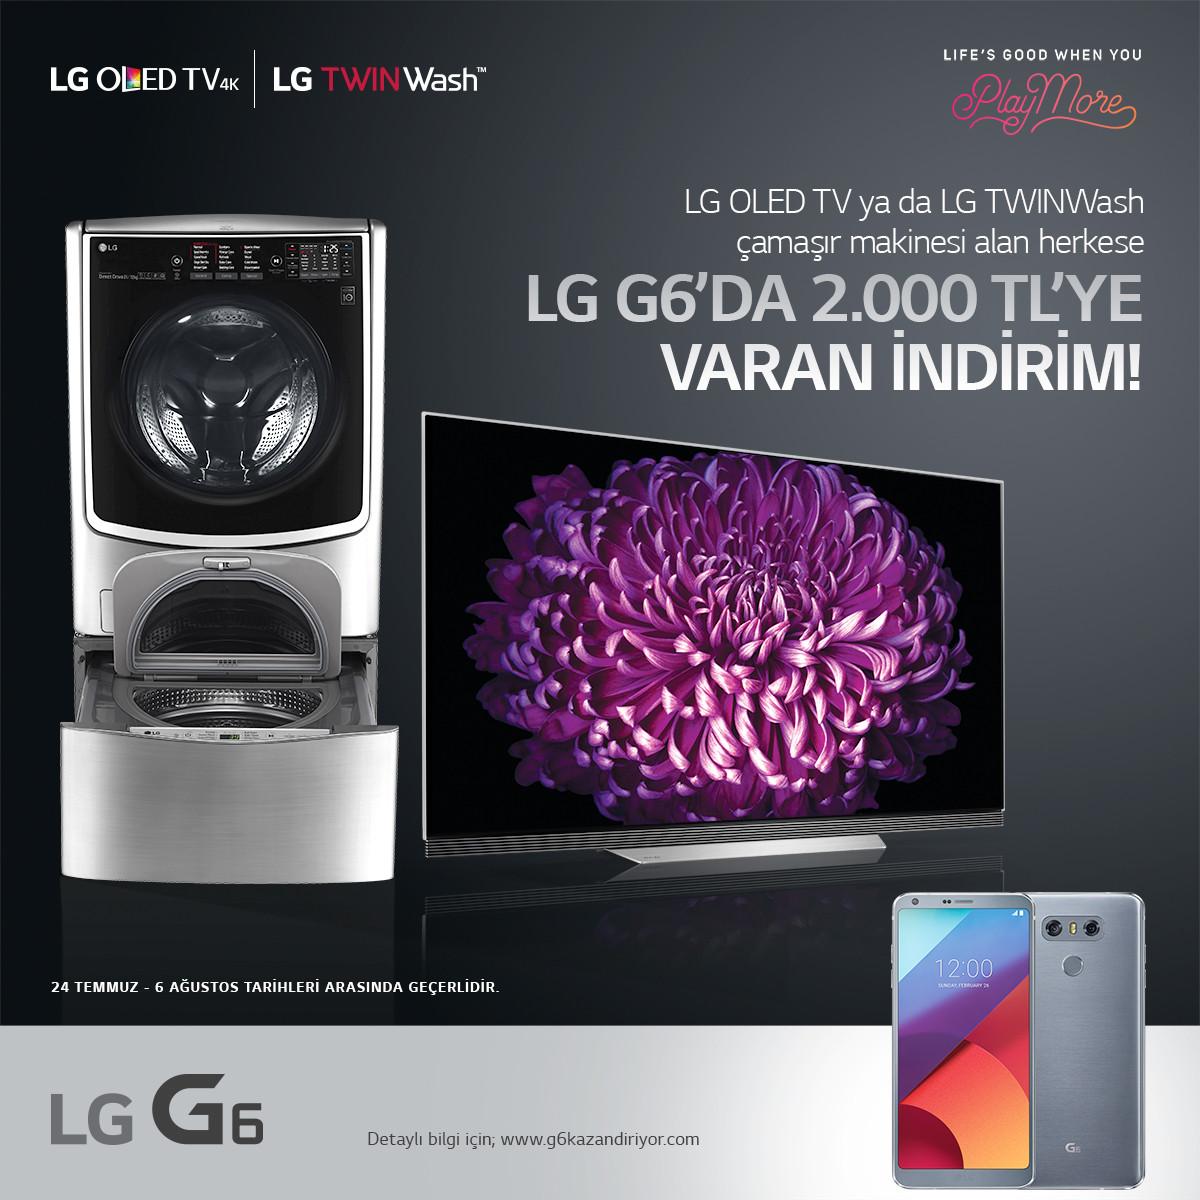 1500882257_lg-g6-indirim.jpg